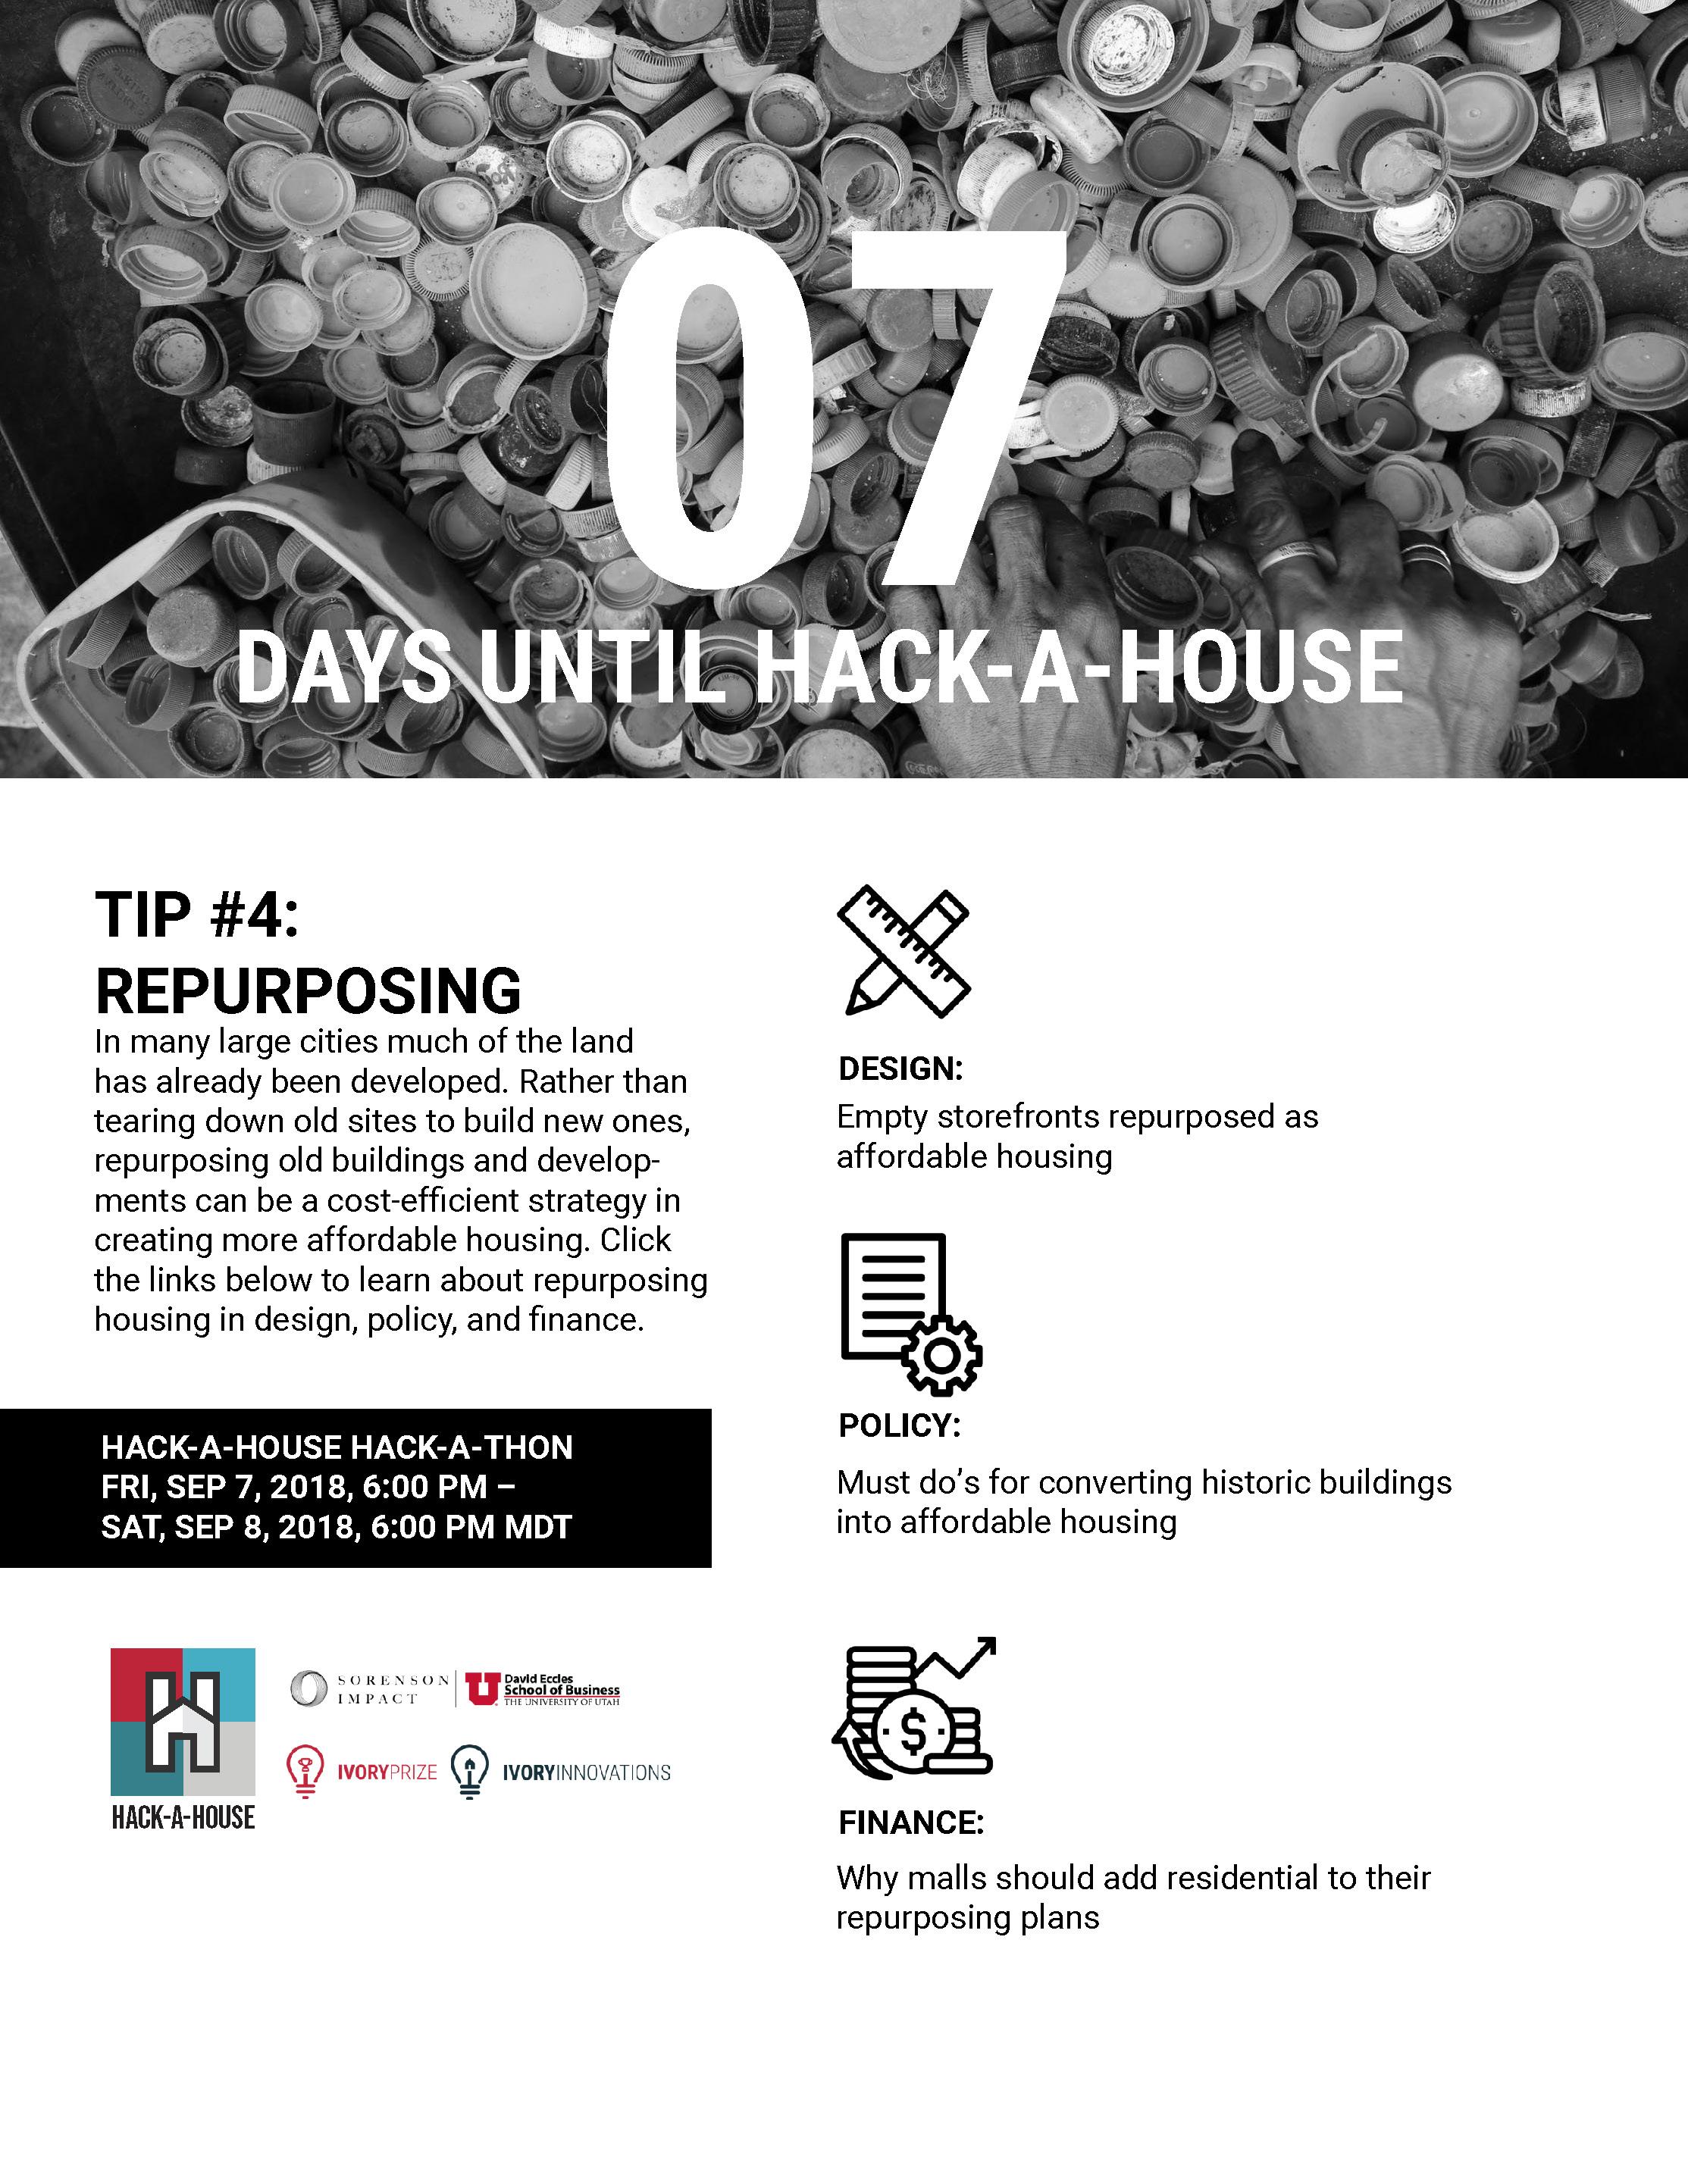 hack-a-house countdown_04.jpg